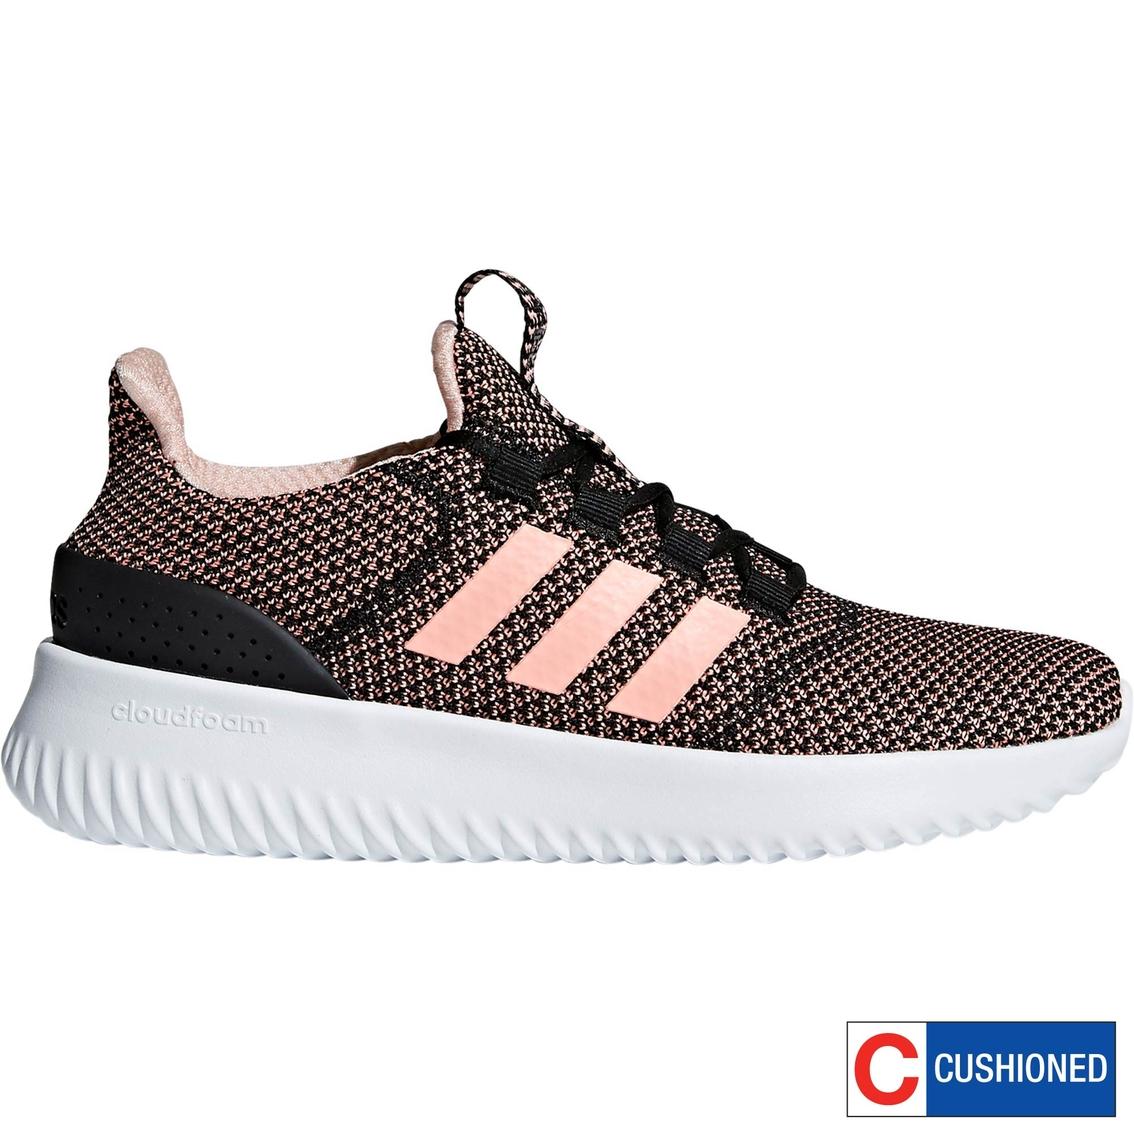 Adidas Women's Cloudfoam Ultimate Running Shoes   Running   Shoes ...